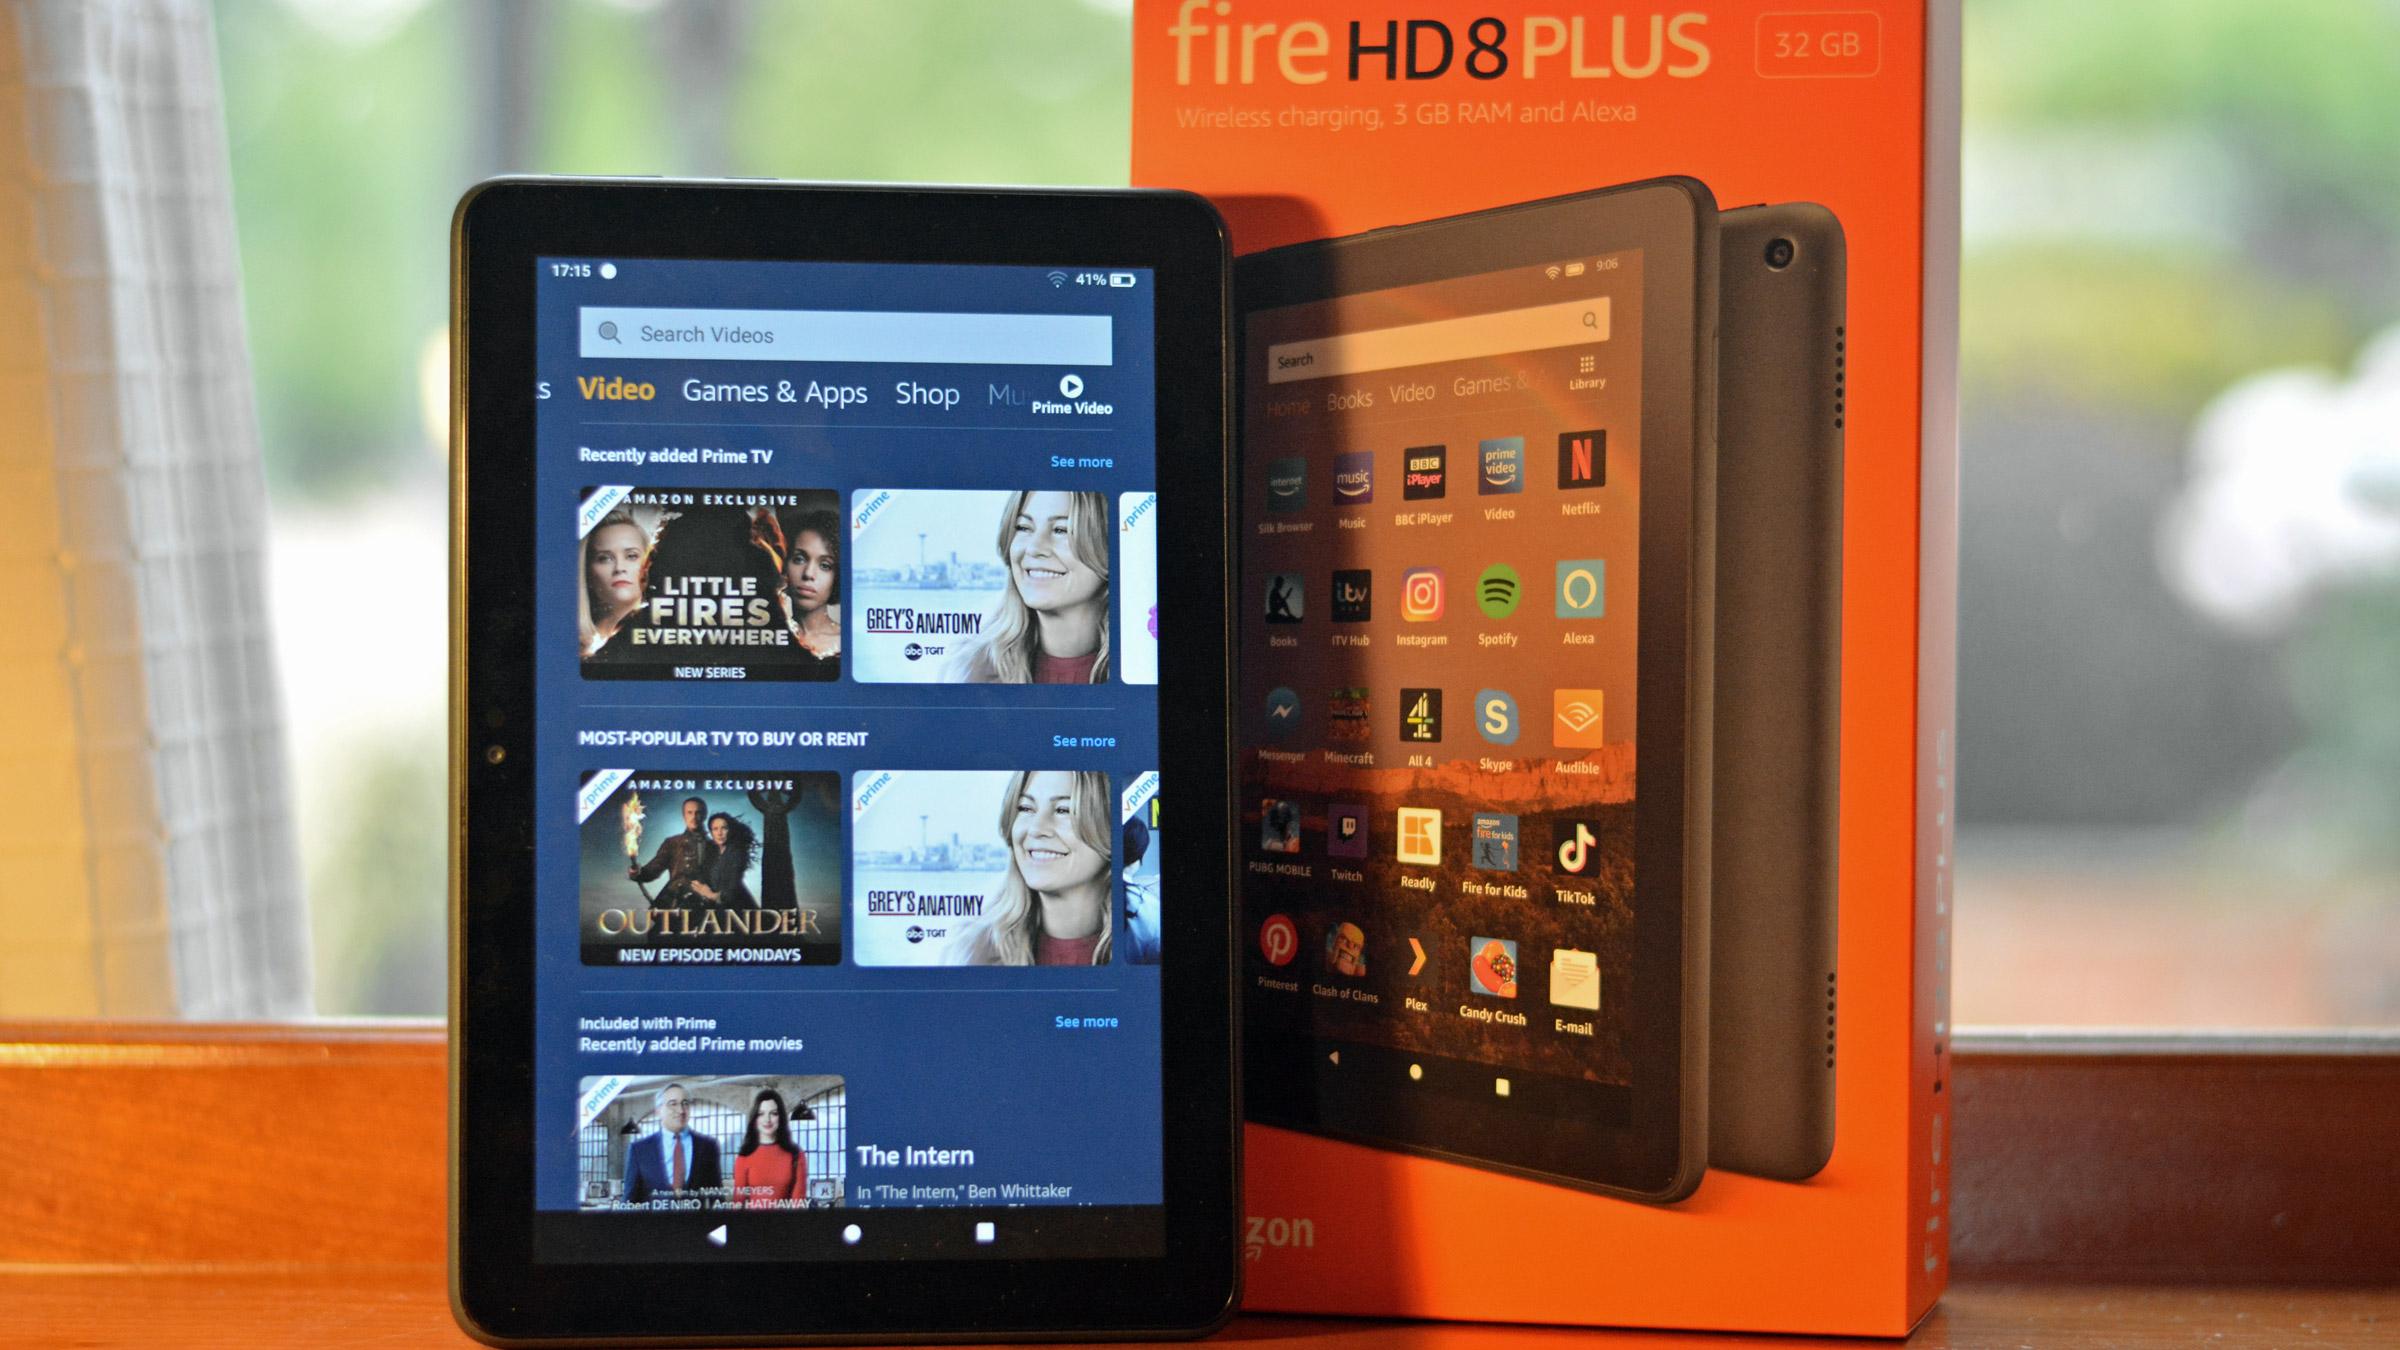 Amazon Fire HD 8 Plus